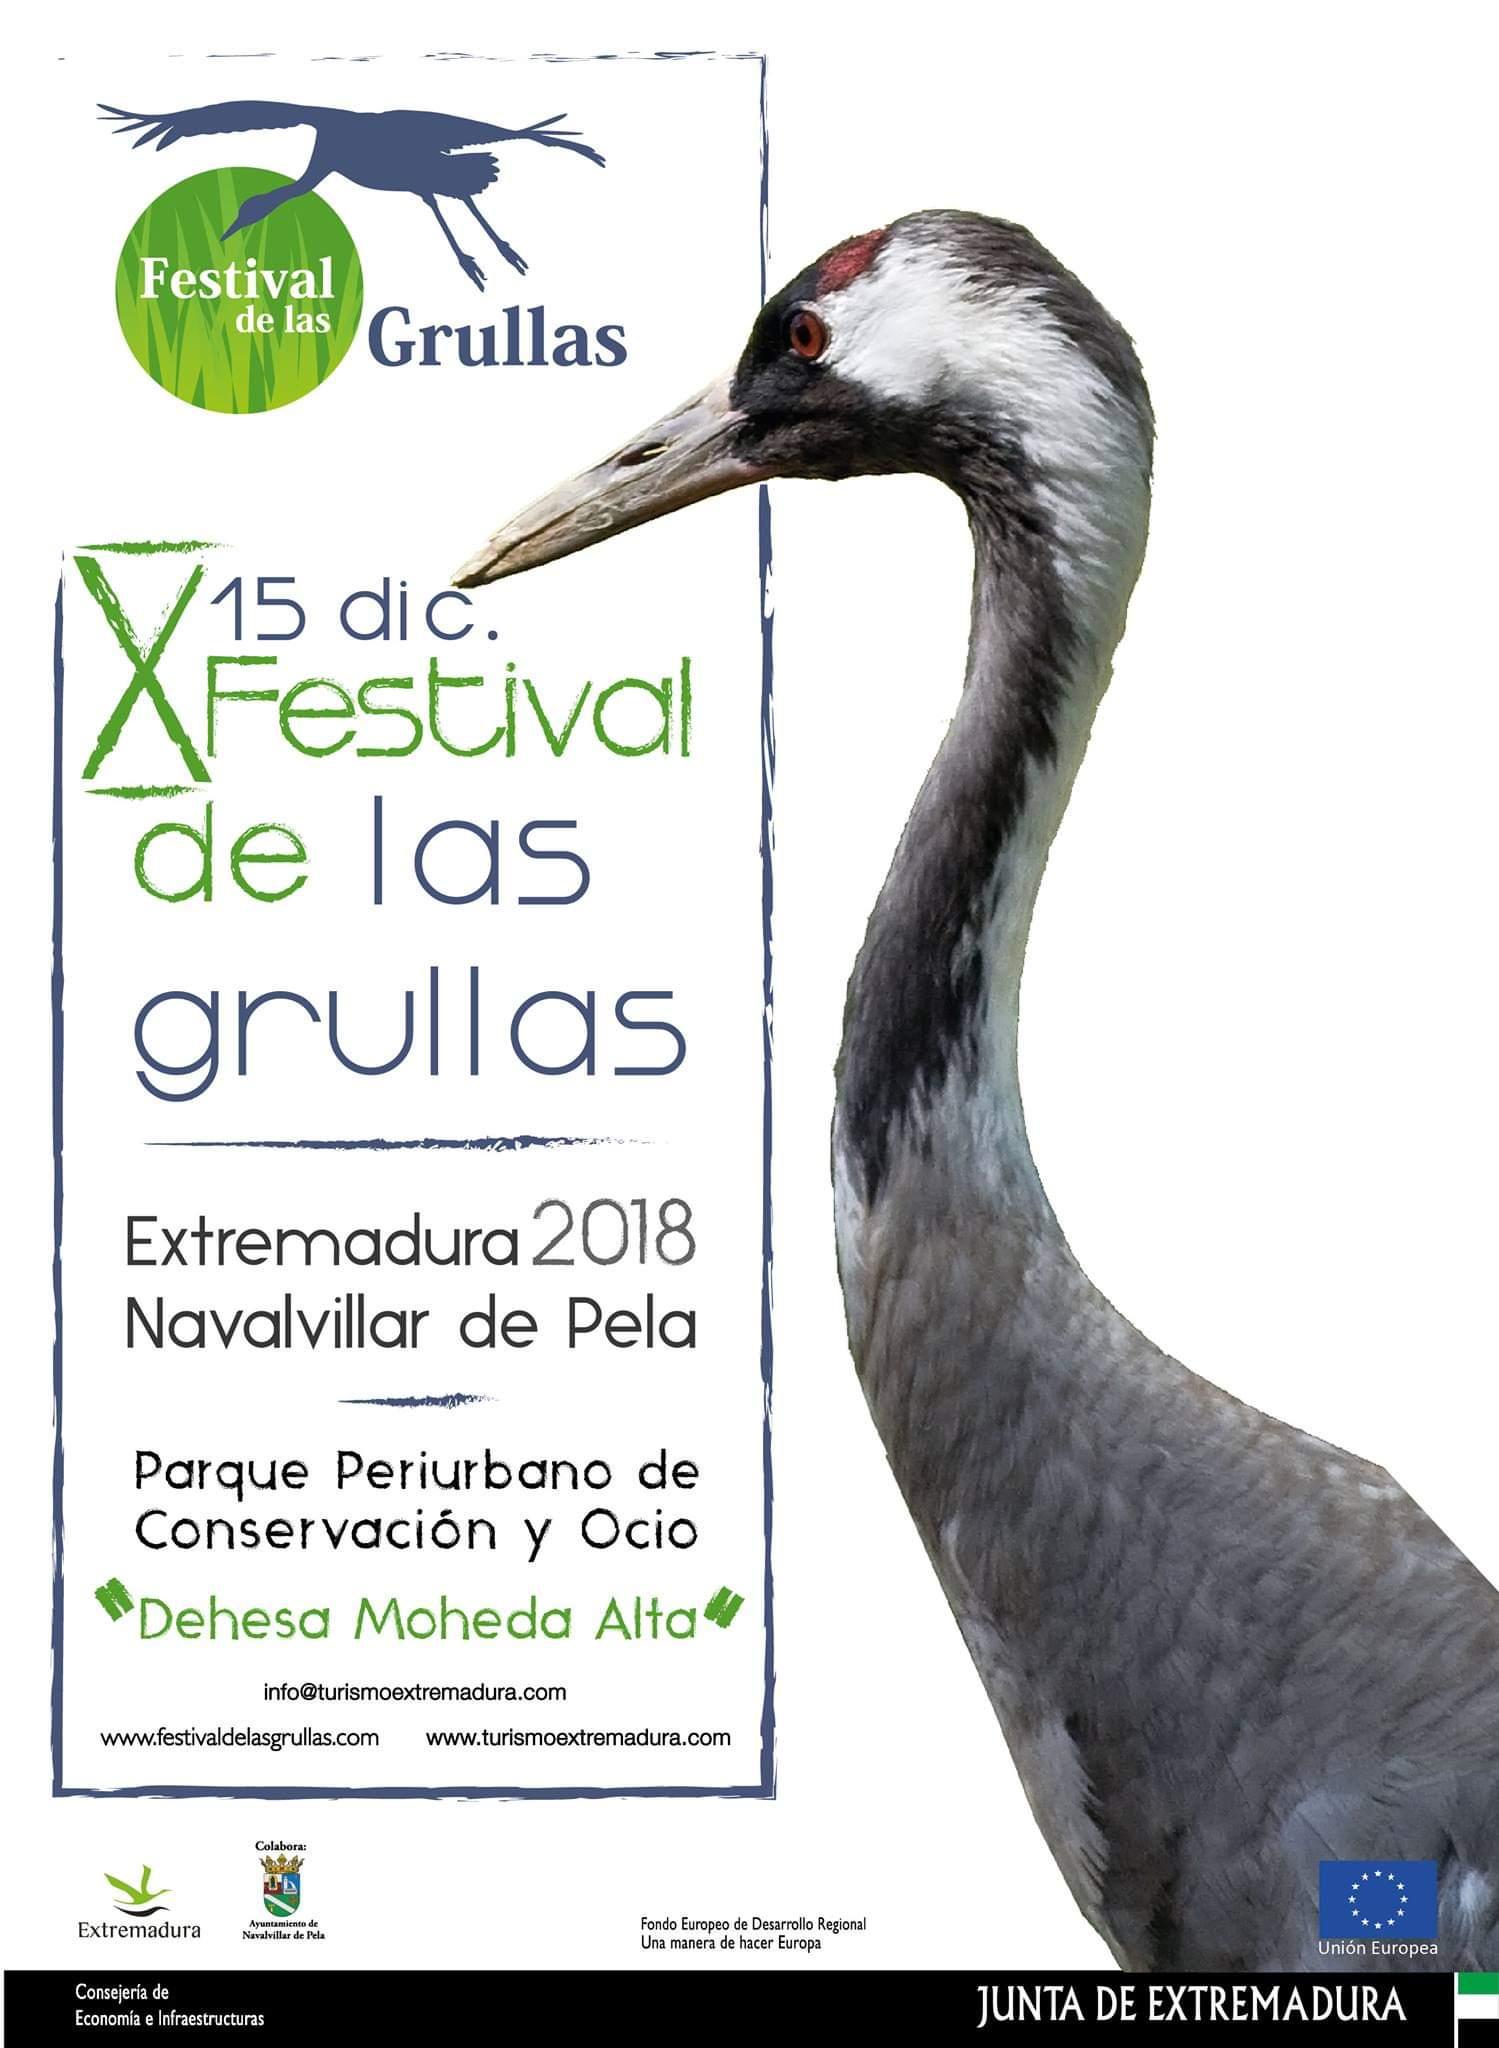 X Festival de las grullas - Navalvillar de Pela (Badajoz)